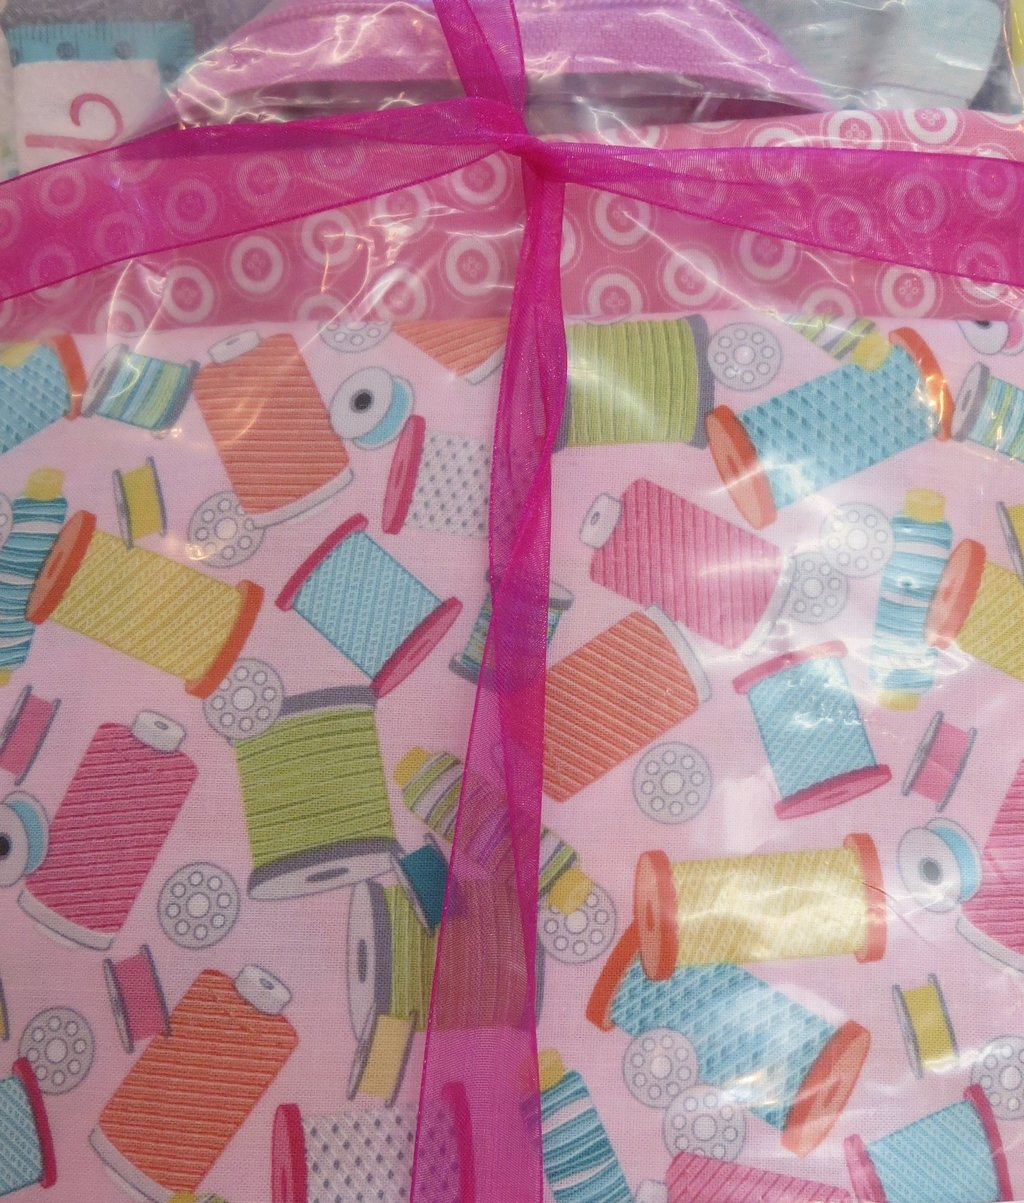 Little Poppins Bag KIT - Pink